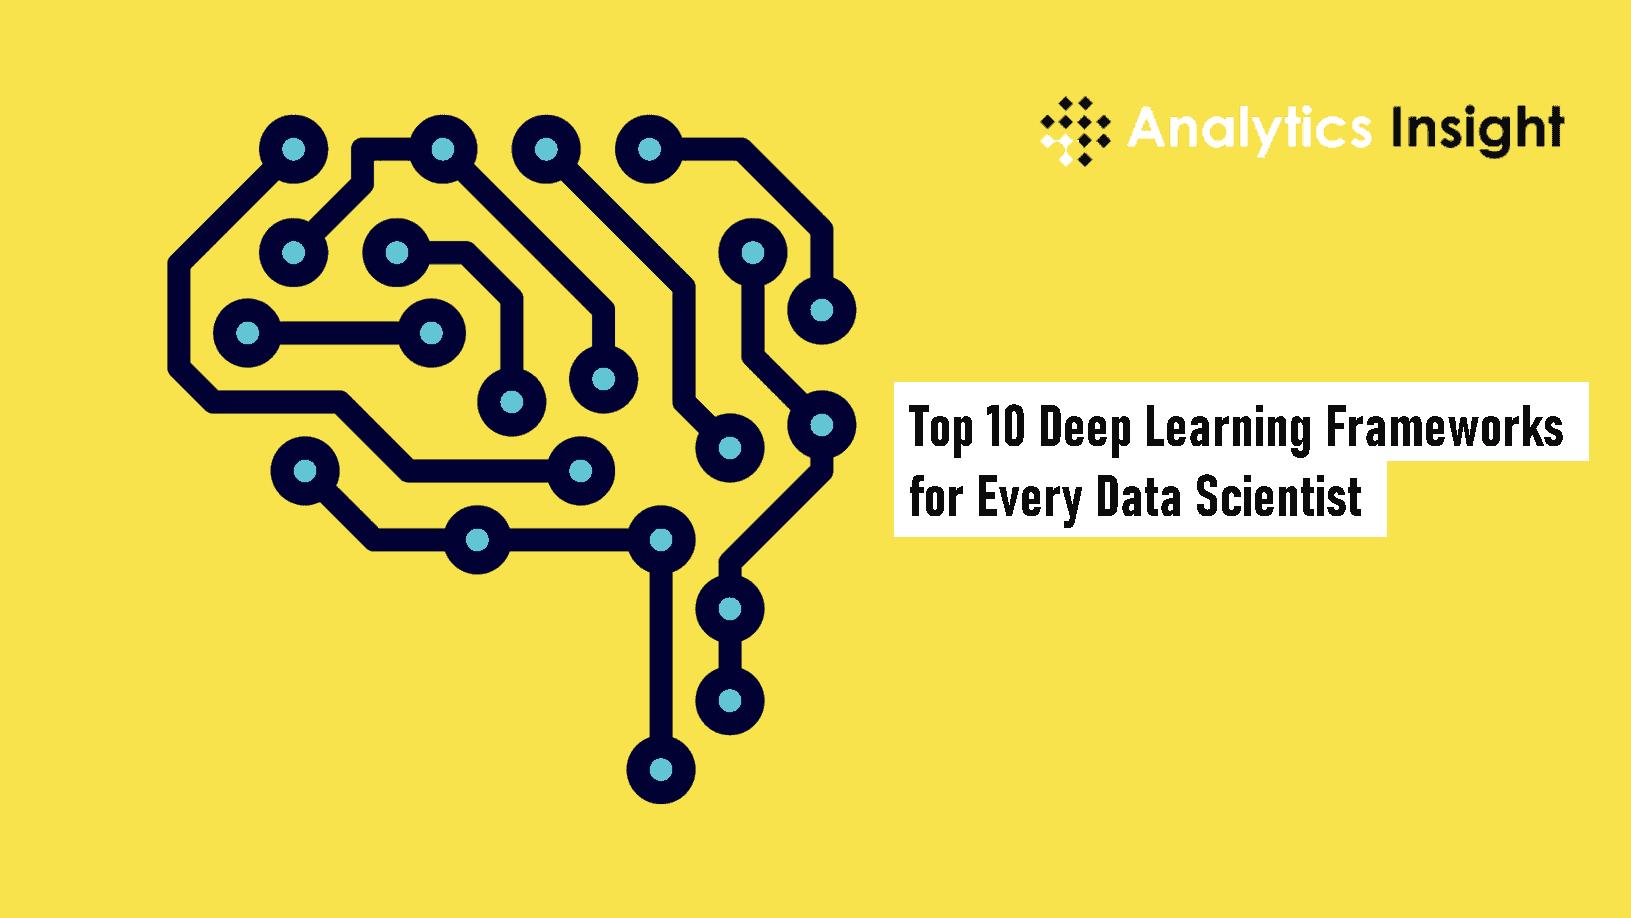 Deep Learning Frameworks for Data Scientists